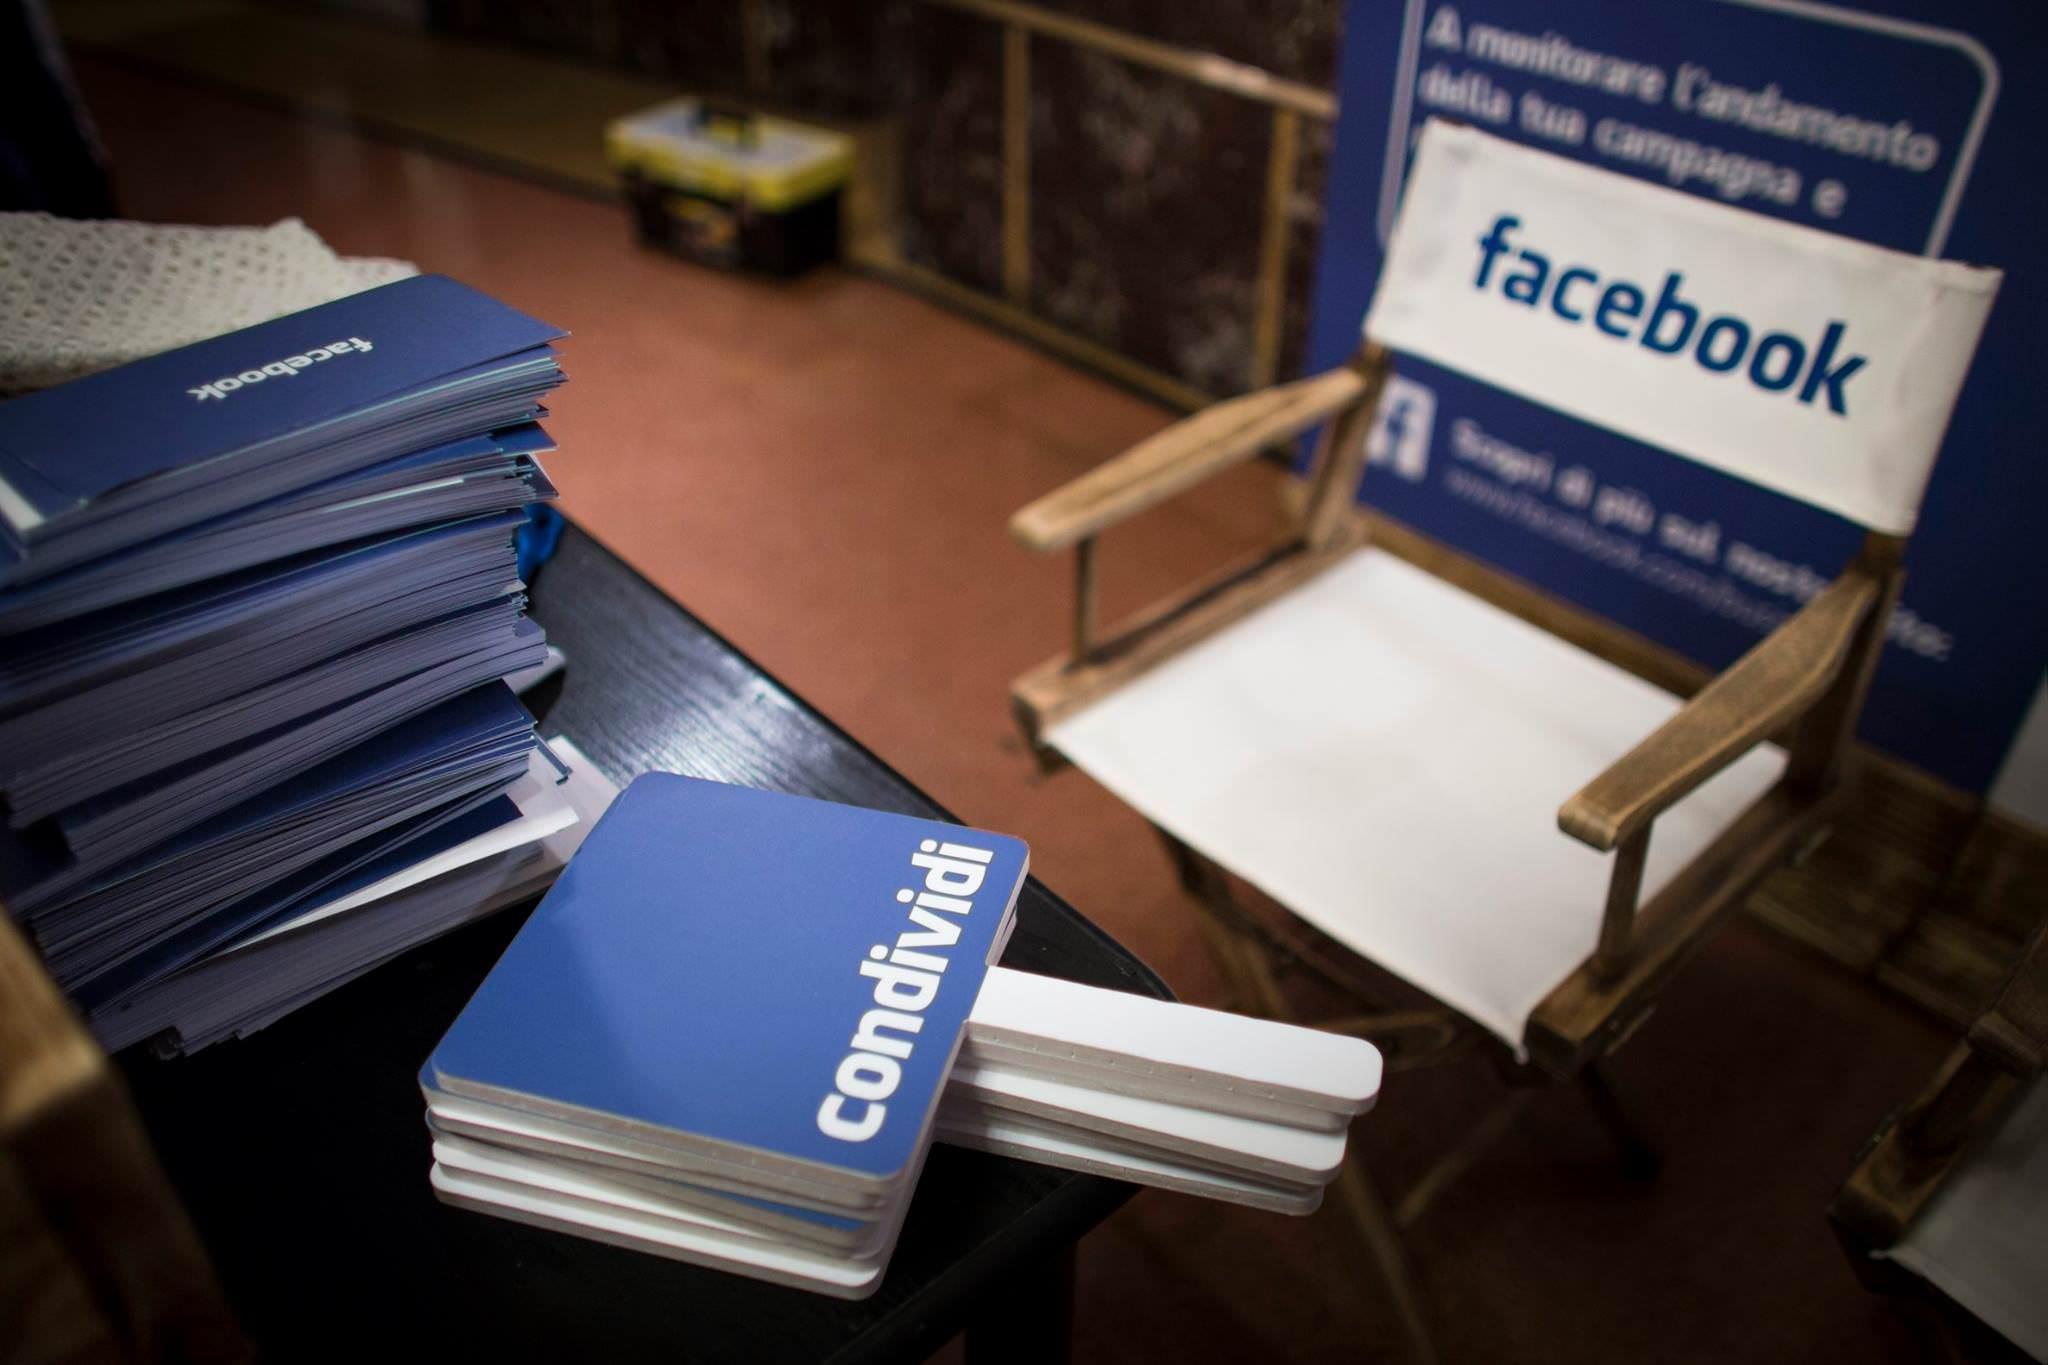 facebook-boost-your-business-gruppo-peroni-eventi-00